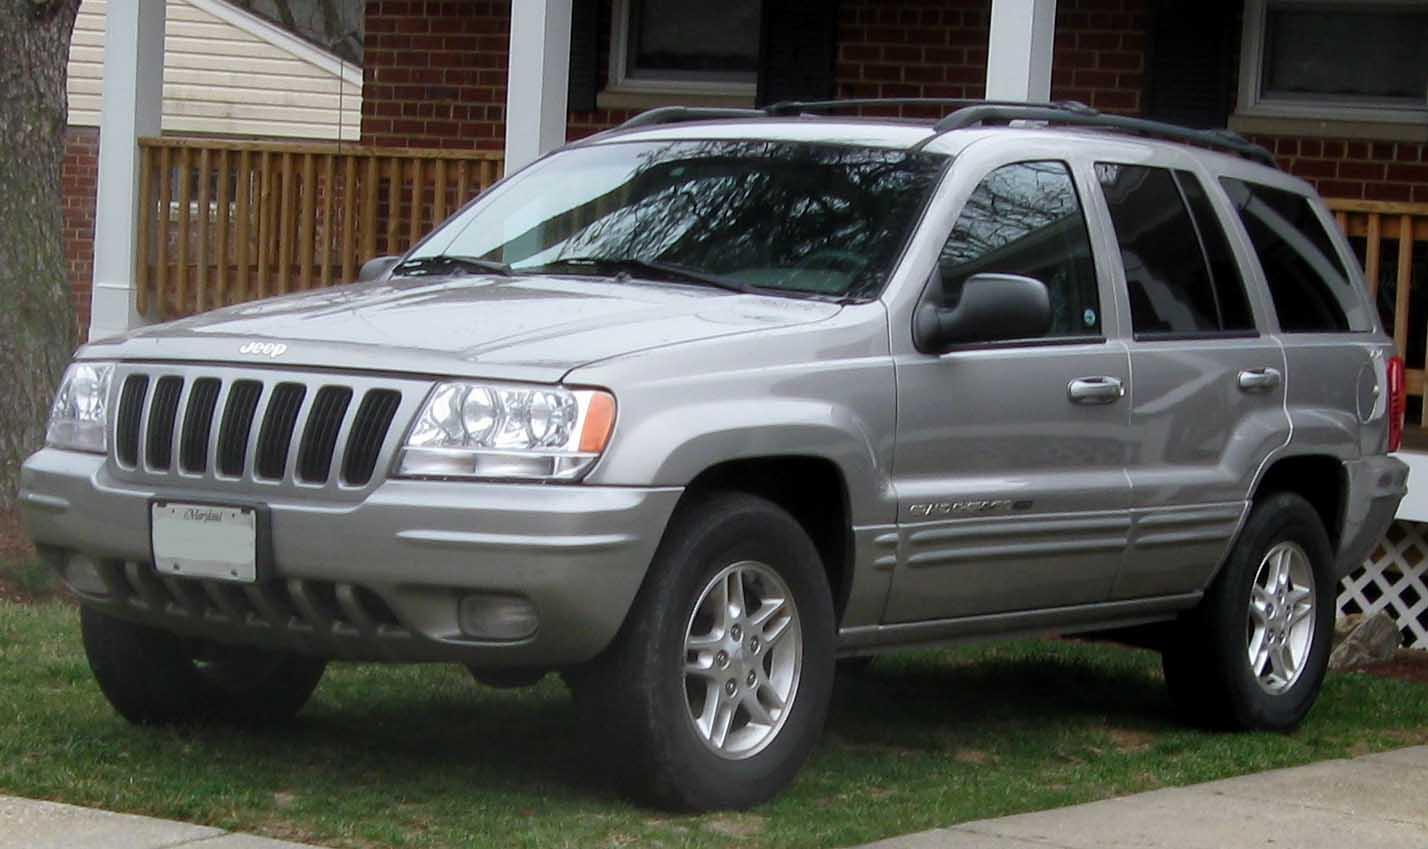 1999 Jeep Grand Cherokee Image 11